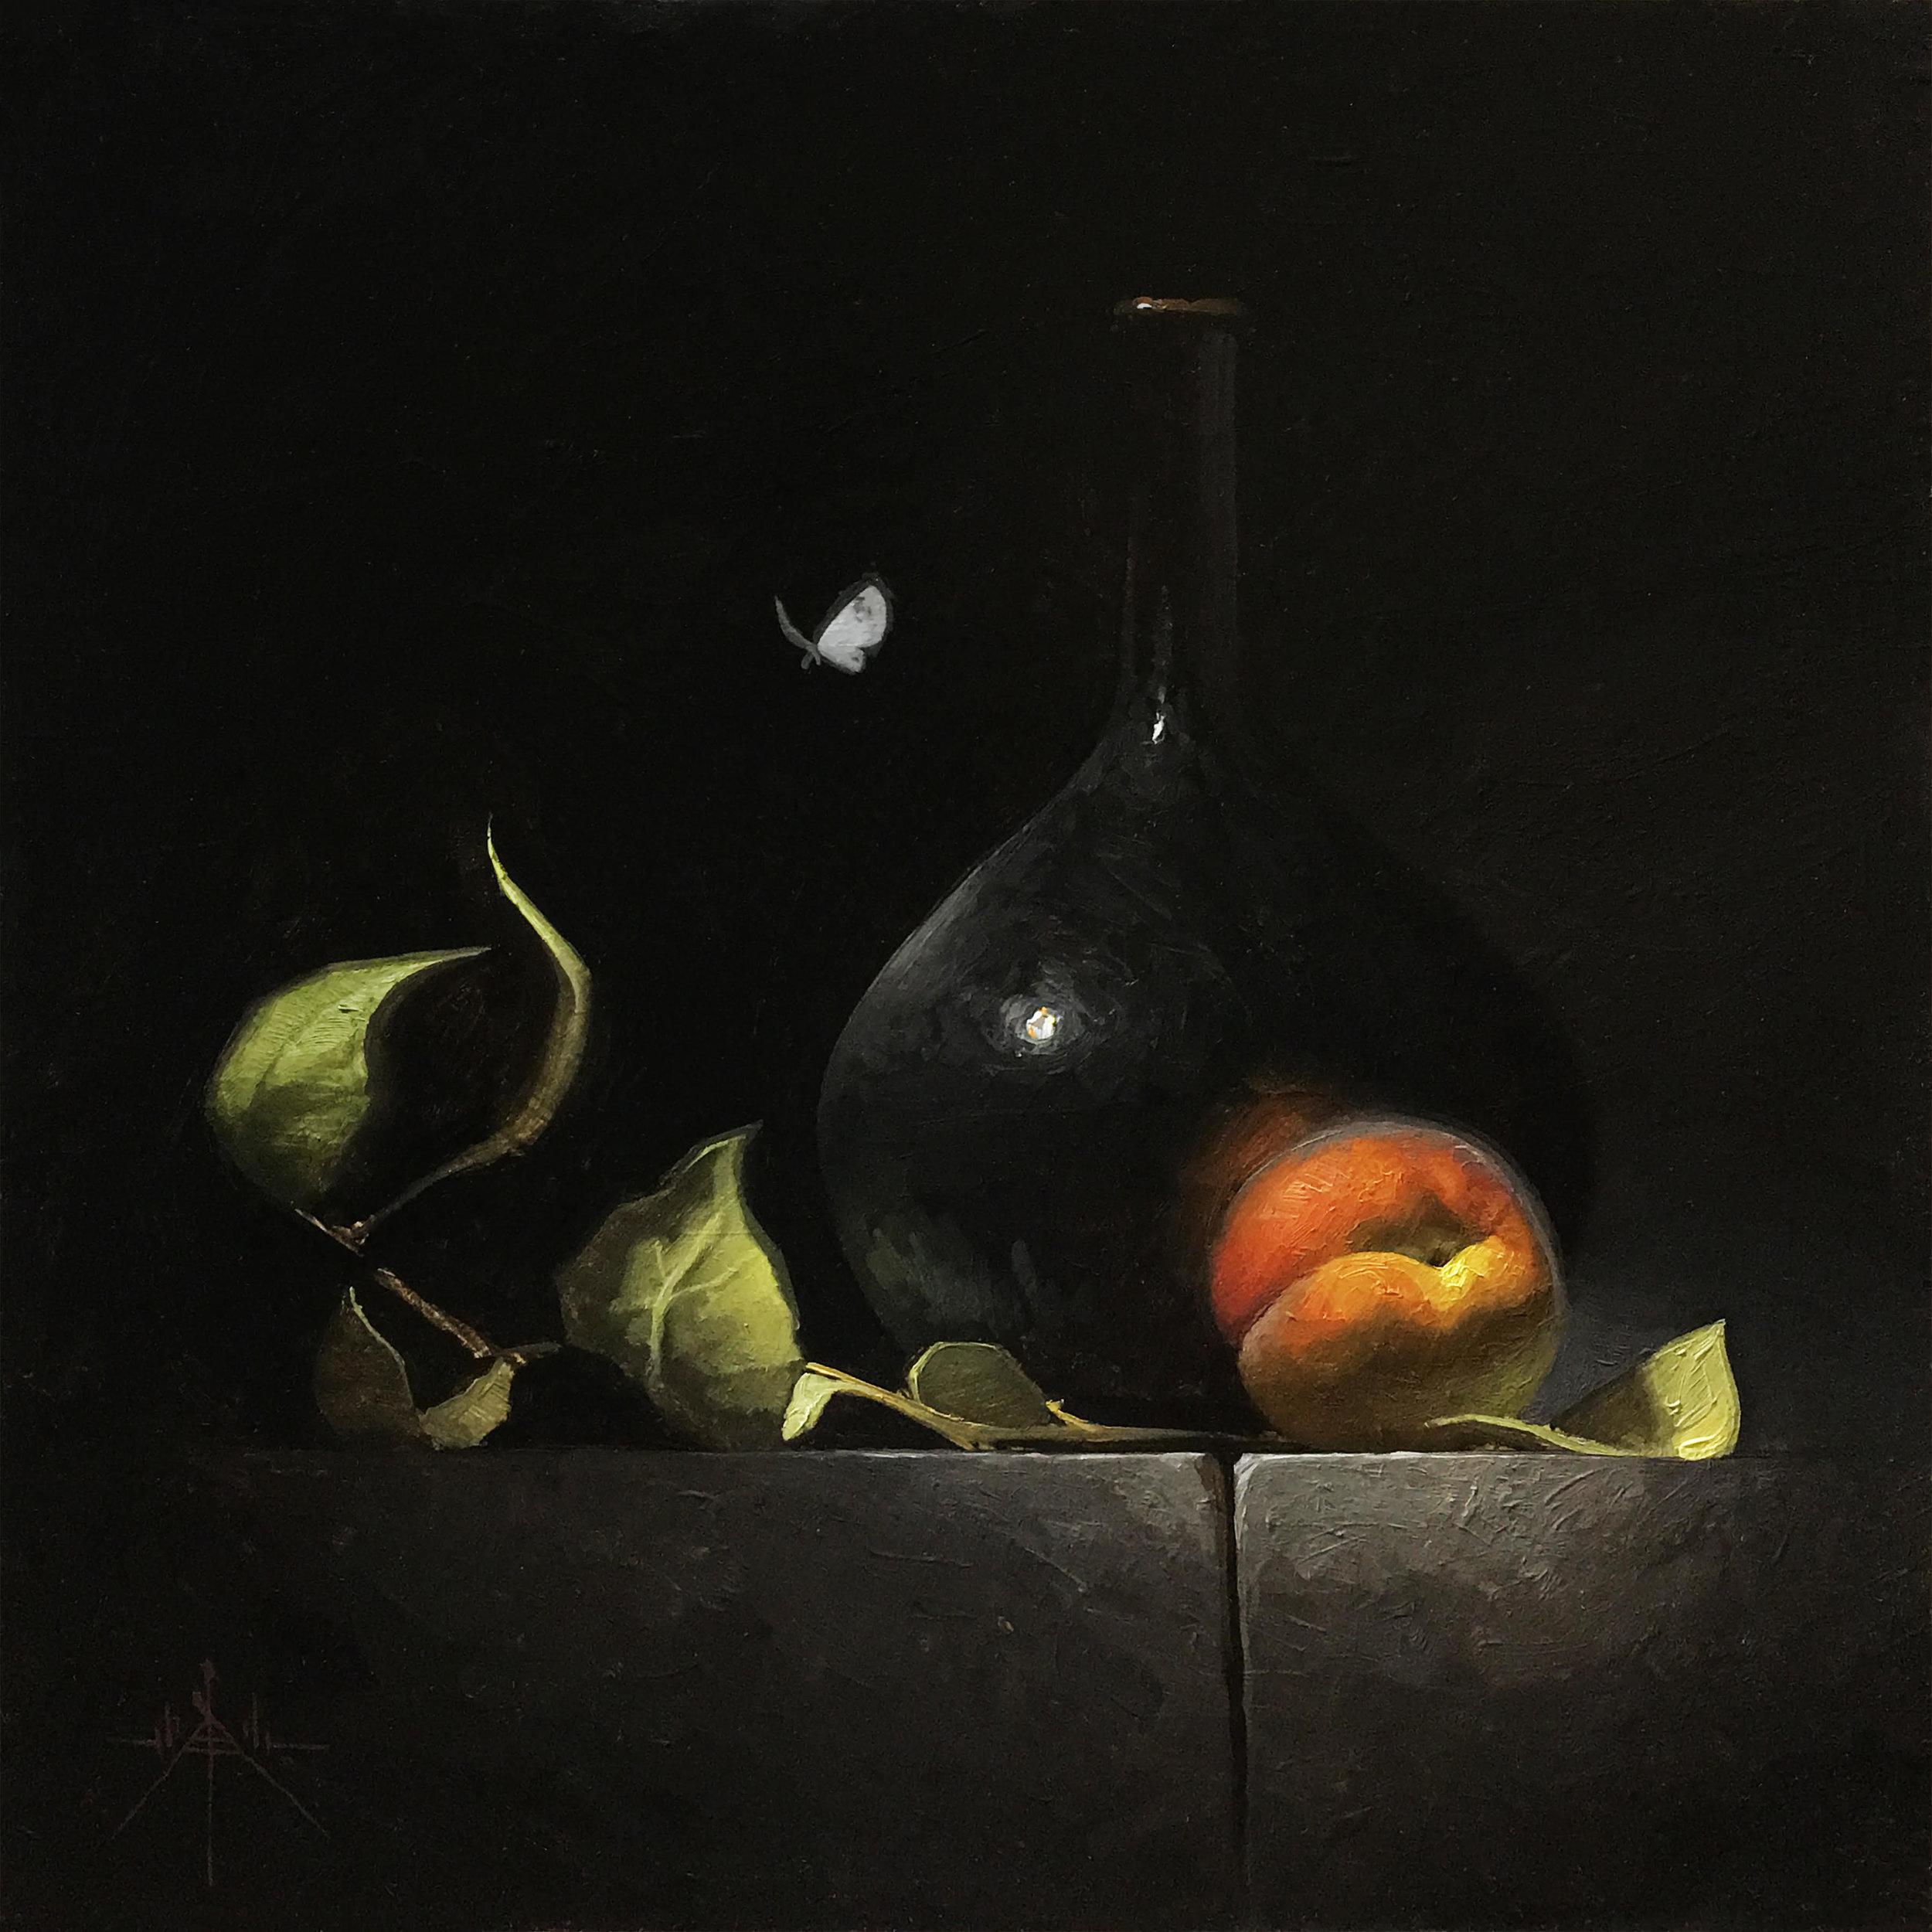 Peach and Dark Vessel by artist Blair Atherholt